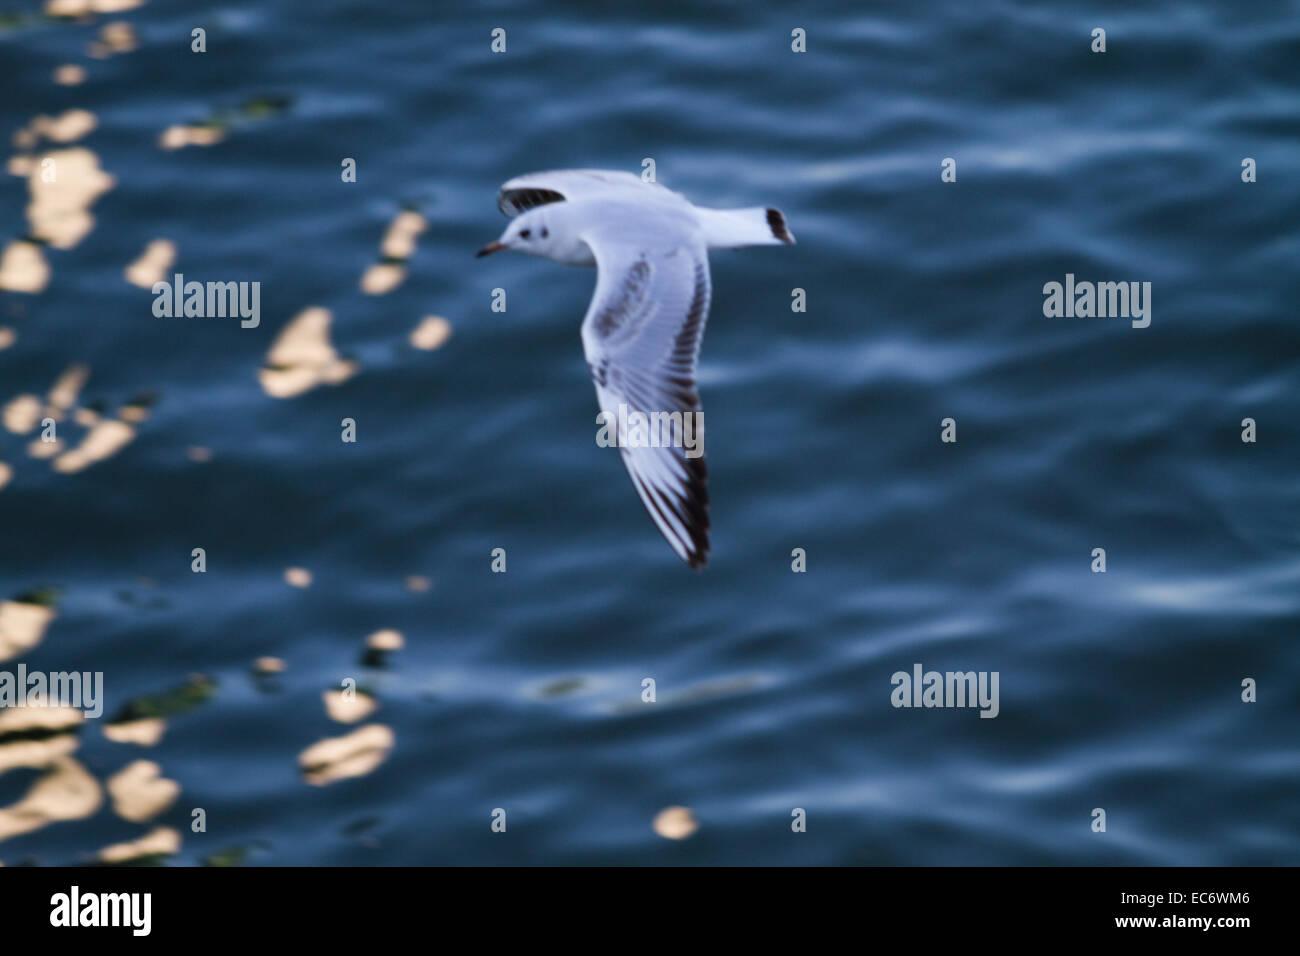 Seagull, Bild - Stock Image